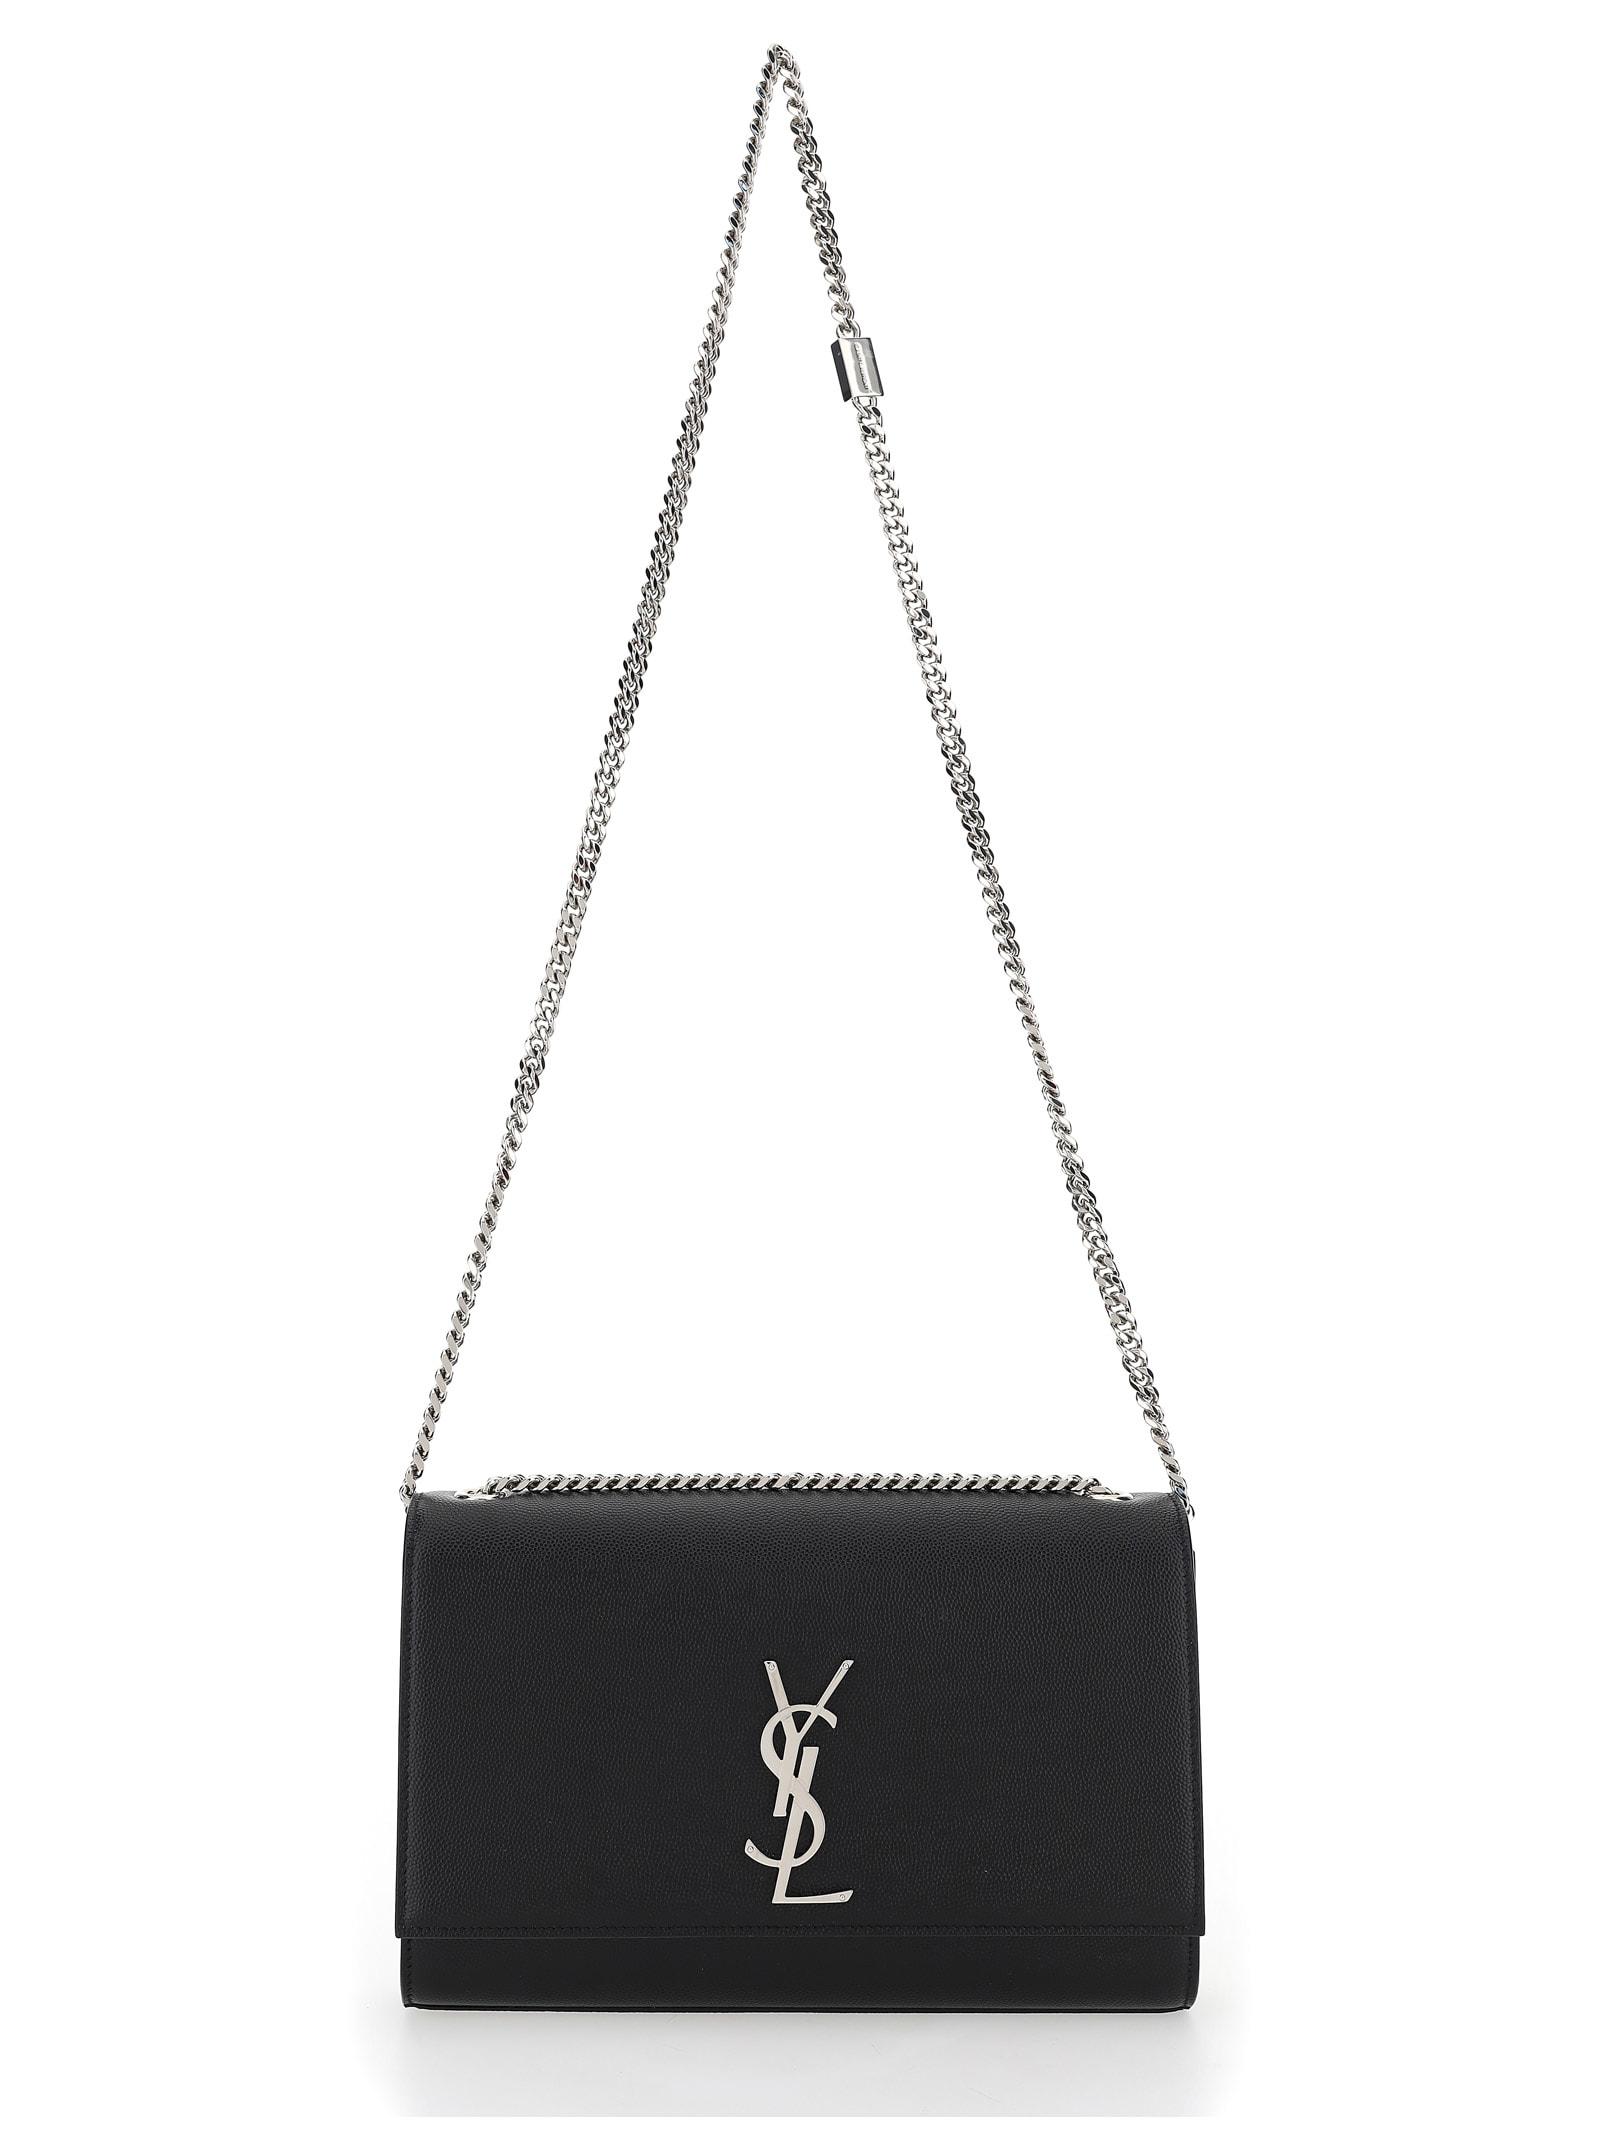 Saint Laurent Kate Medium Shoulder Bag In Nero